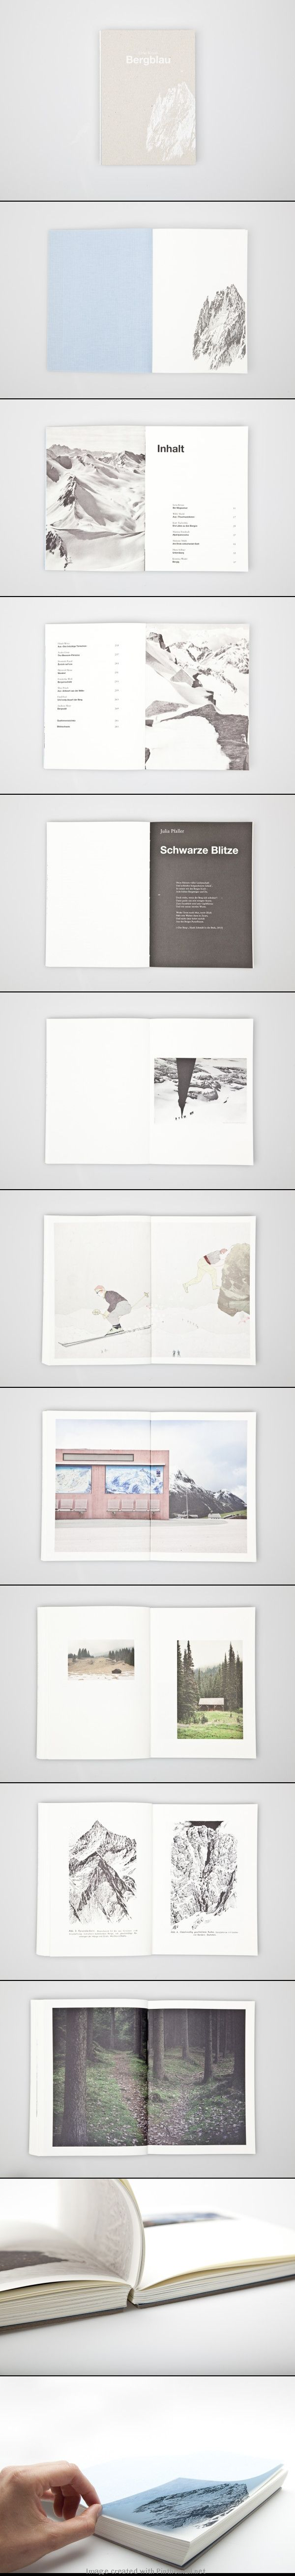 Bergblau book design by Lena Kraus                              …